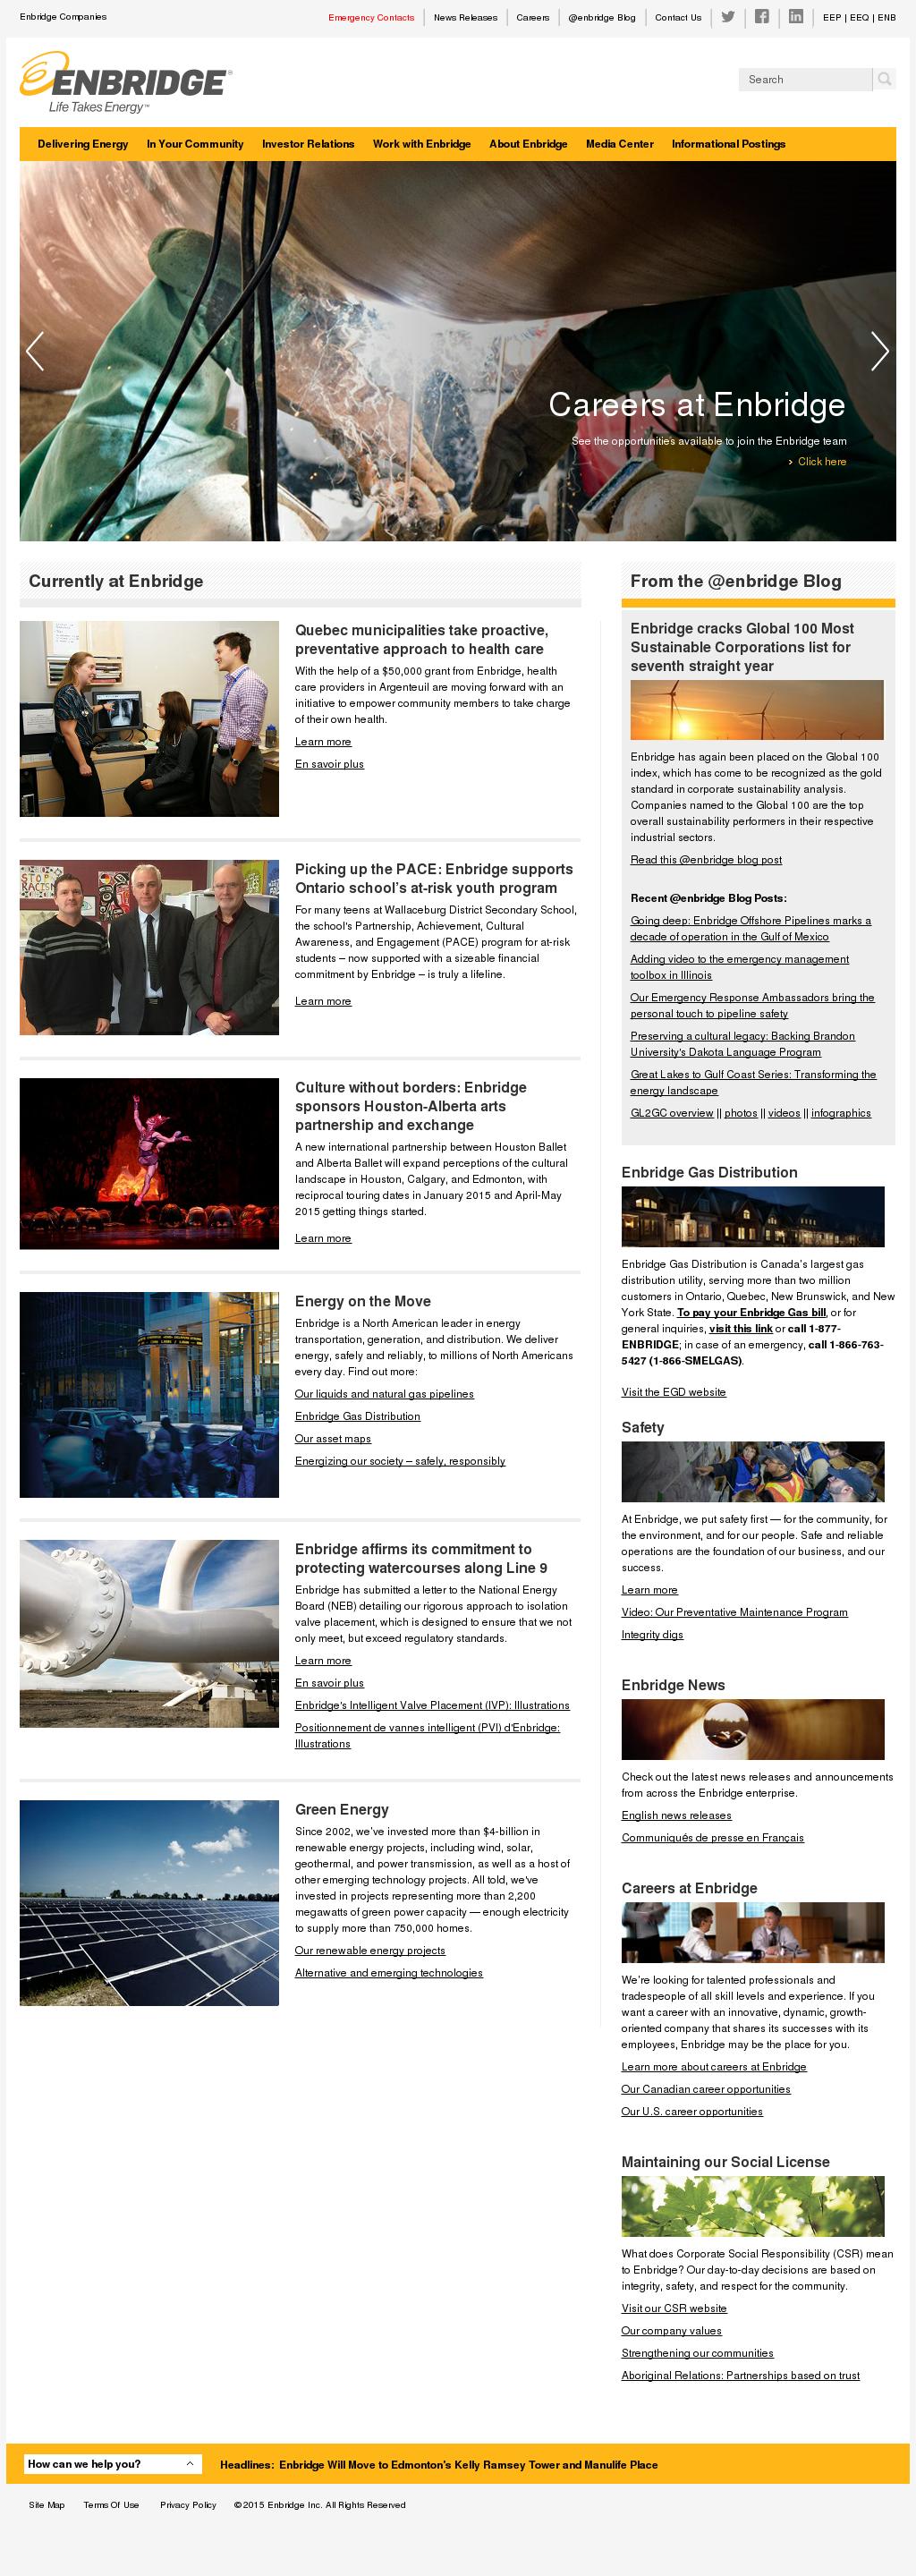 Enbridge Competitors, Revenue and Employees - Owler Company